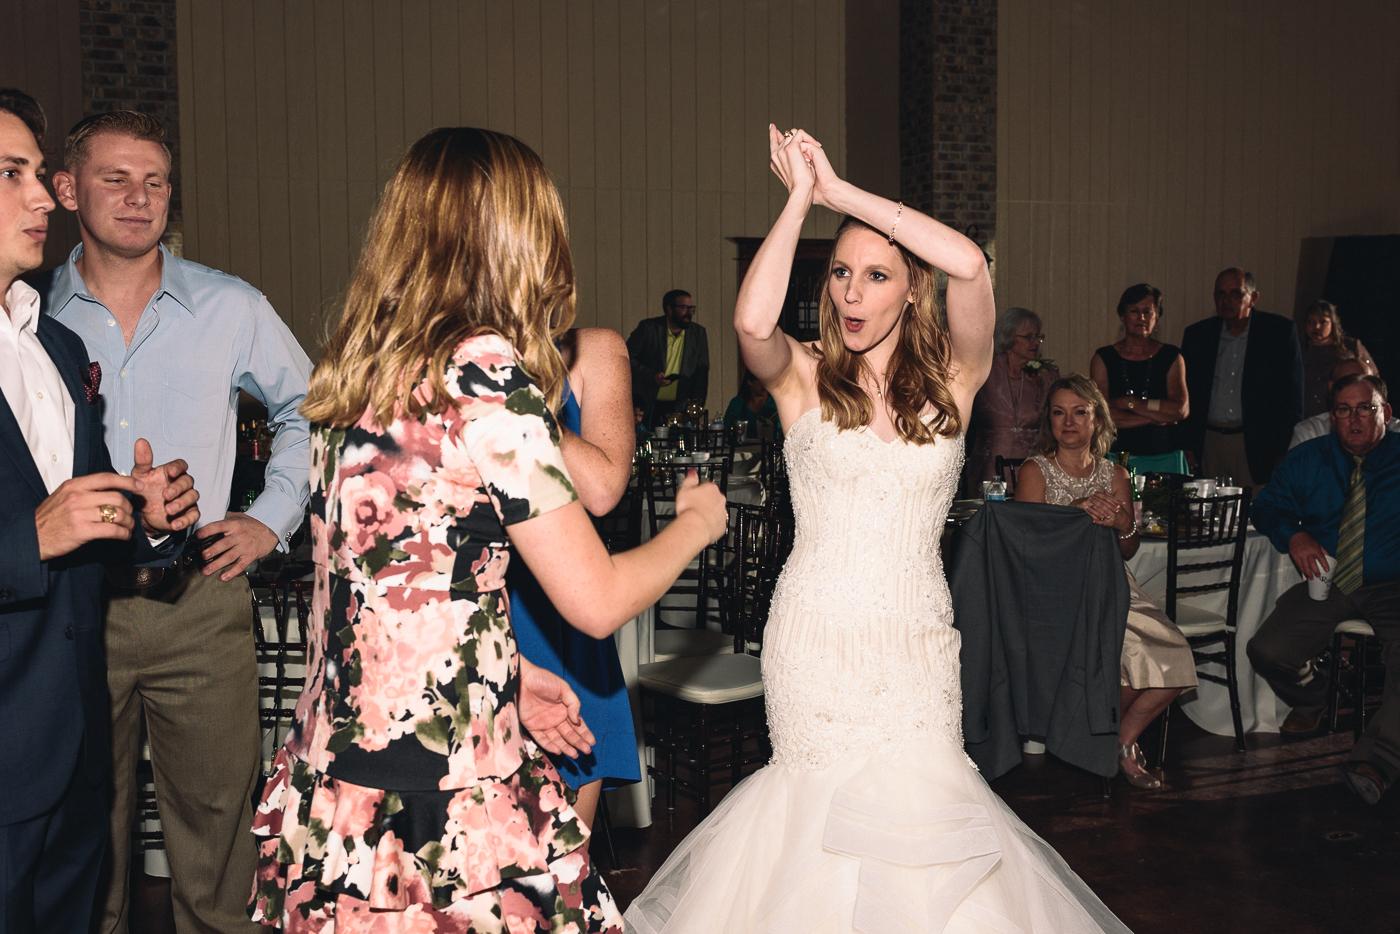 whoop aggie wedding bride wedding ceremony